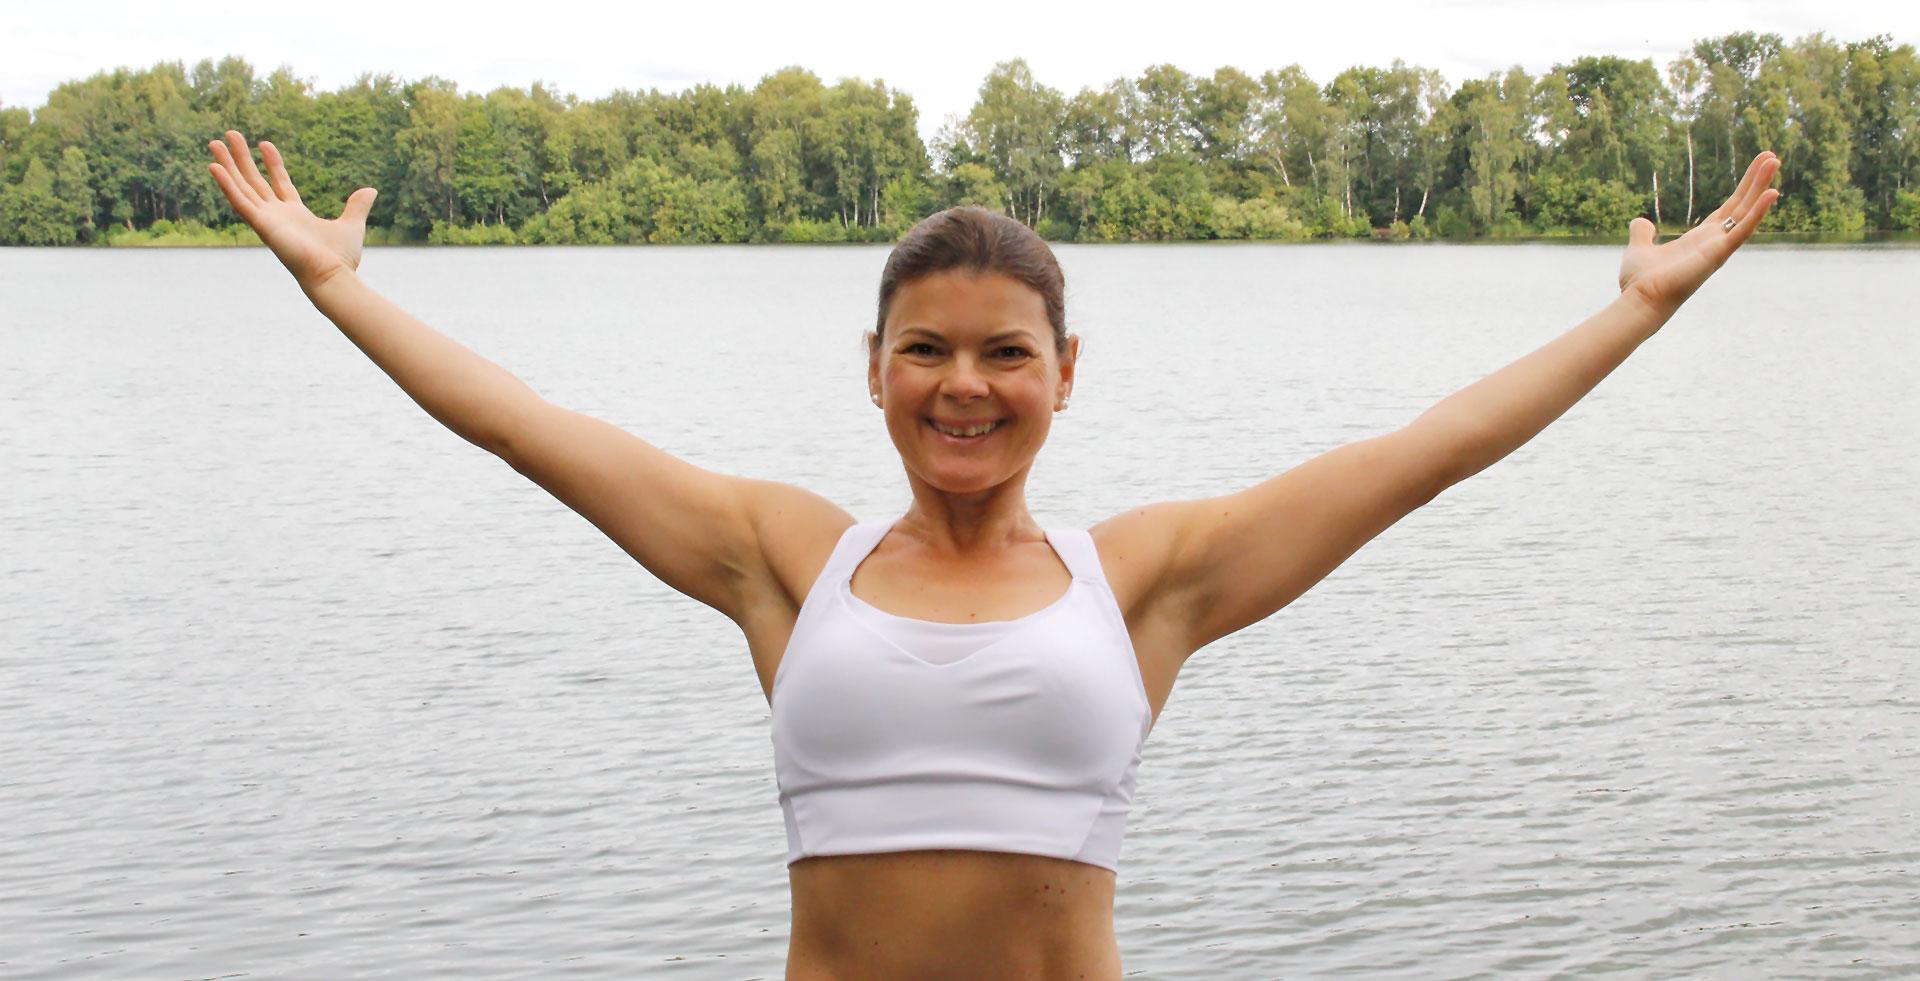 Yoga in Winsen Startseite Diana Rick